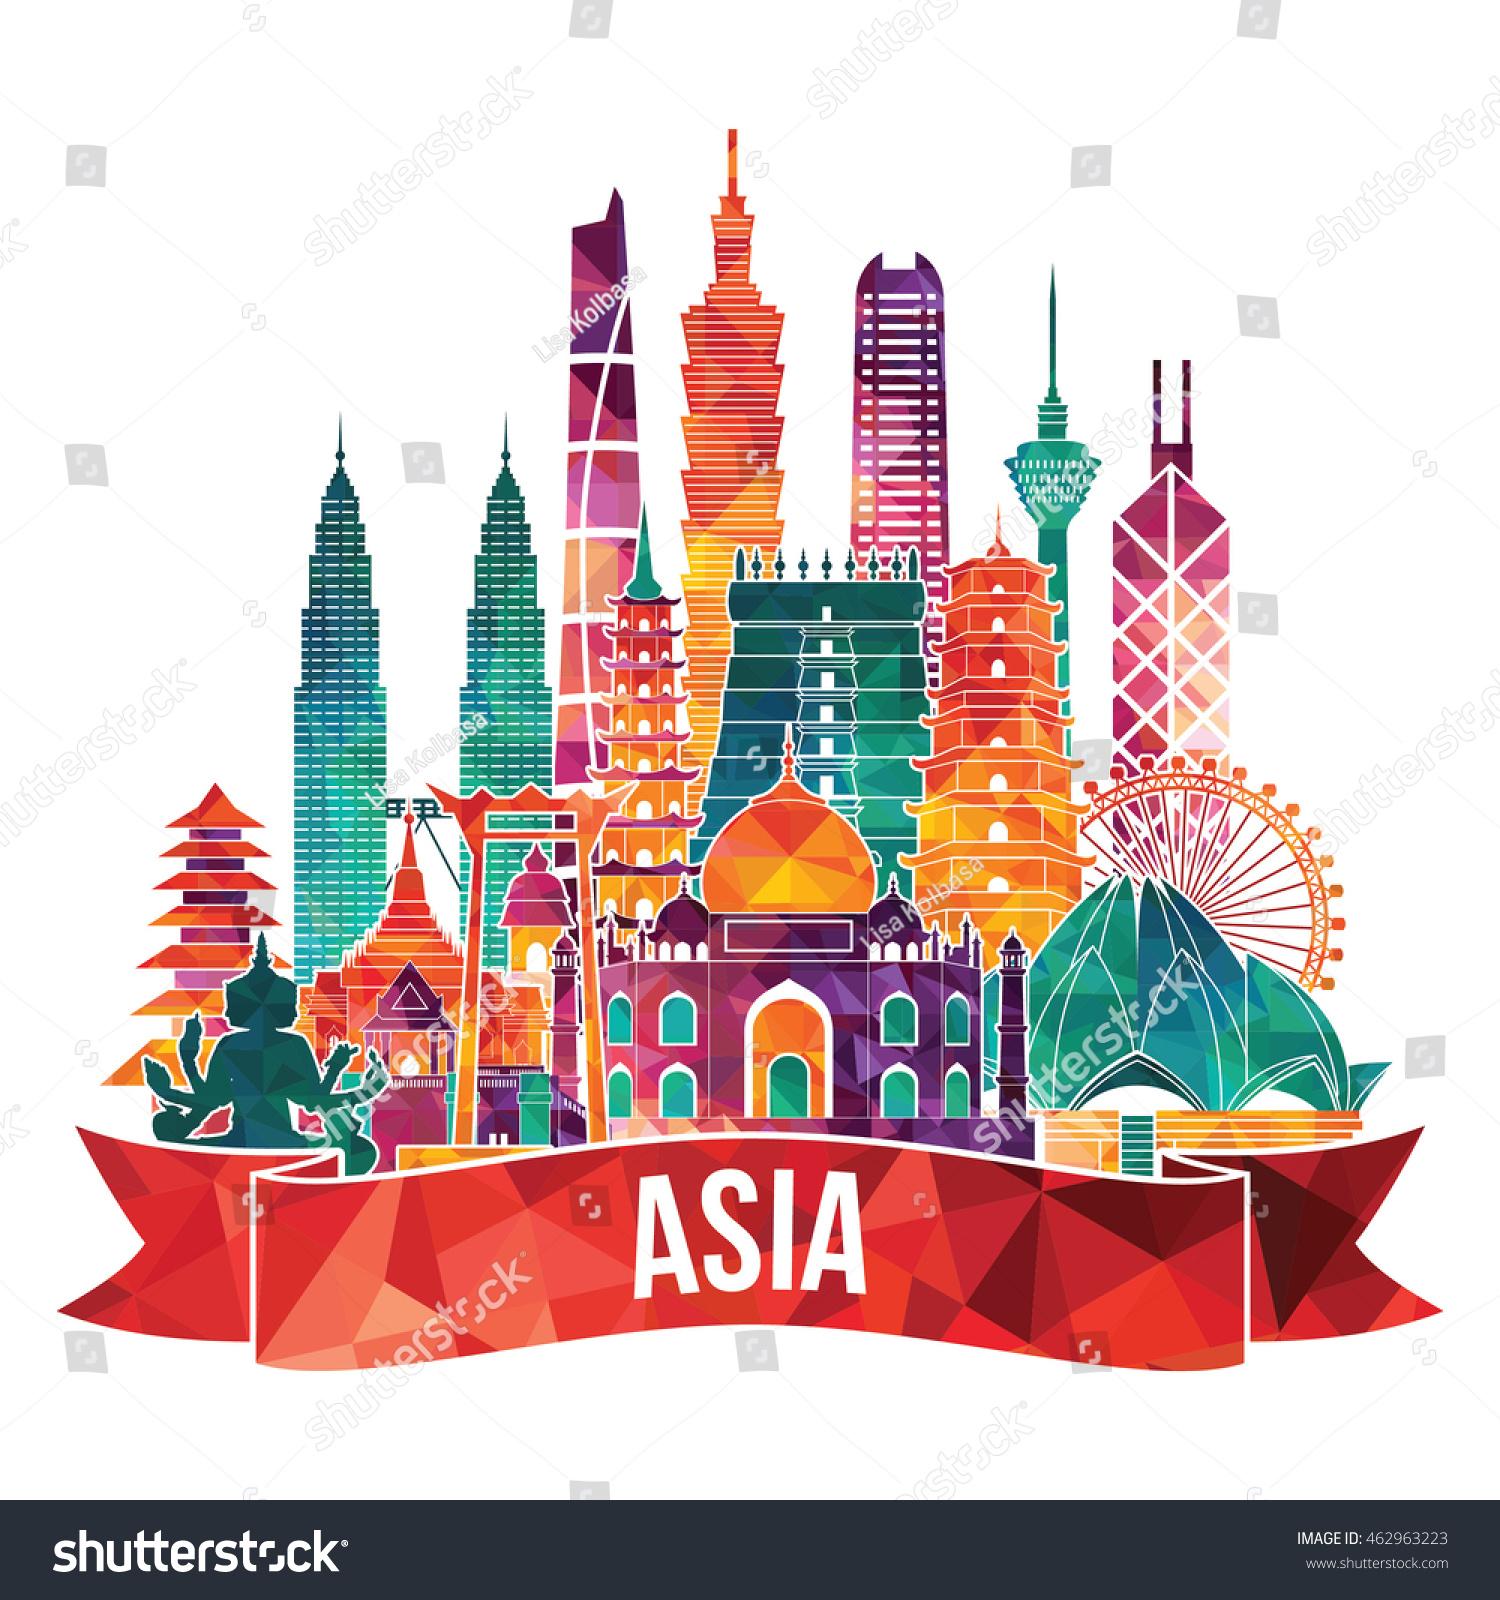 Asia Skyline Detailed Silhouette Travel Tourism Stock